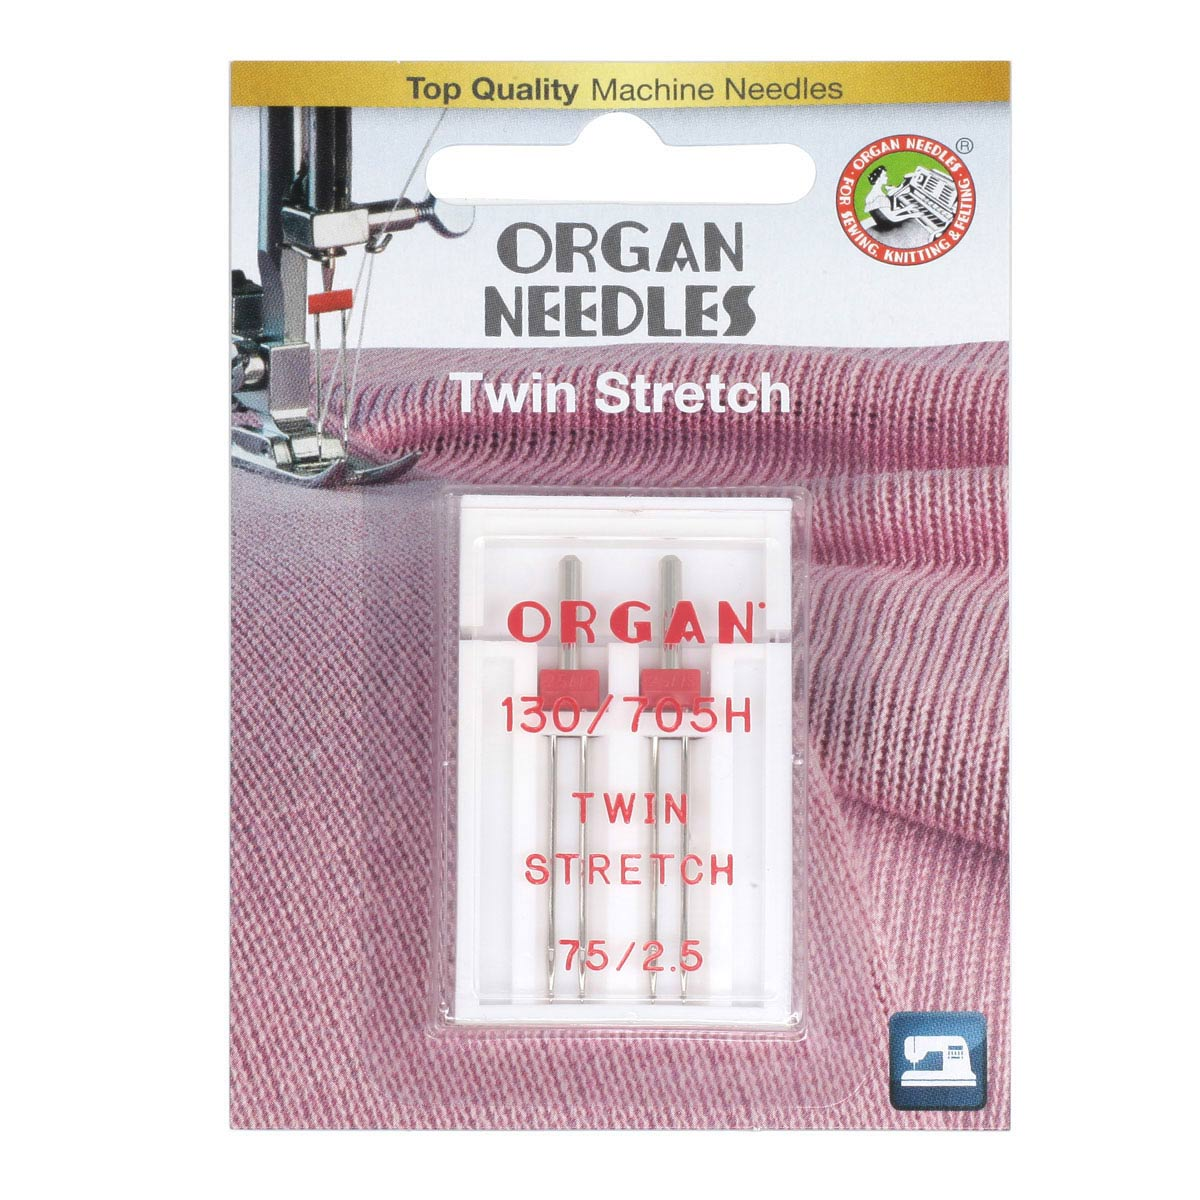 ORGAN иглы двойные 2-75/2,5 супер стрейч Blister